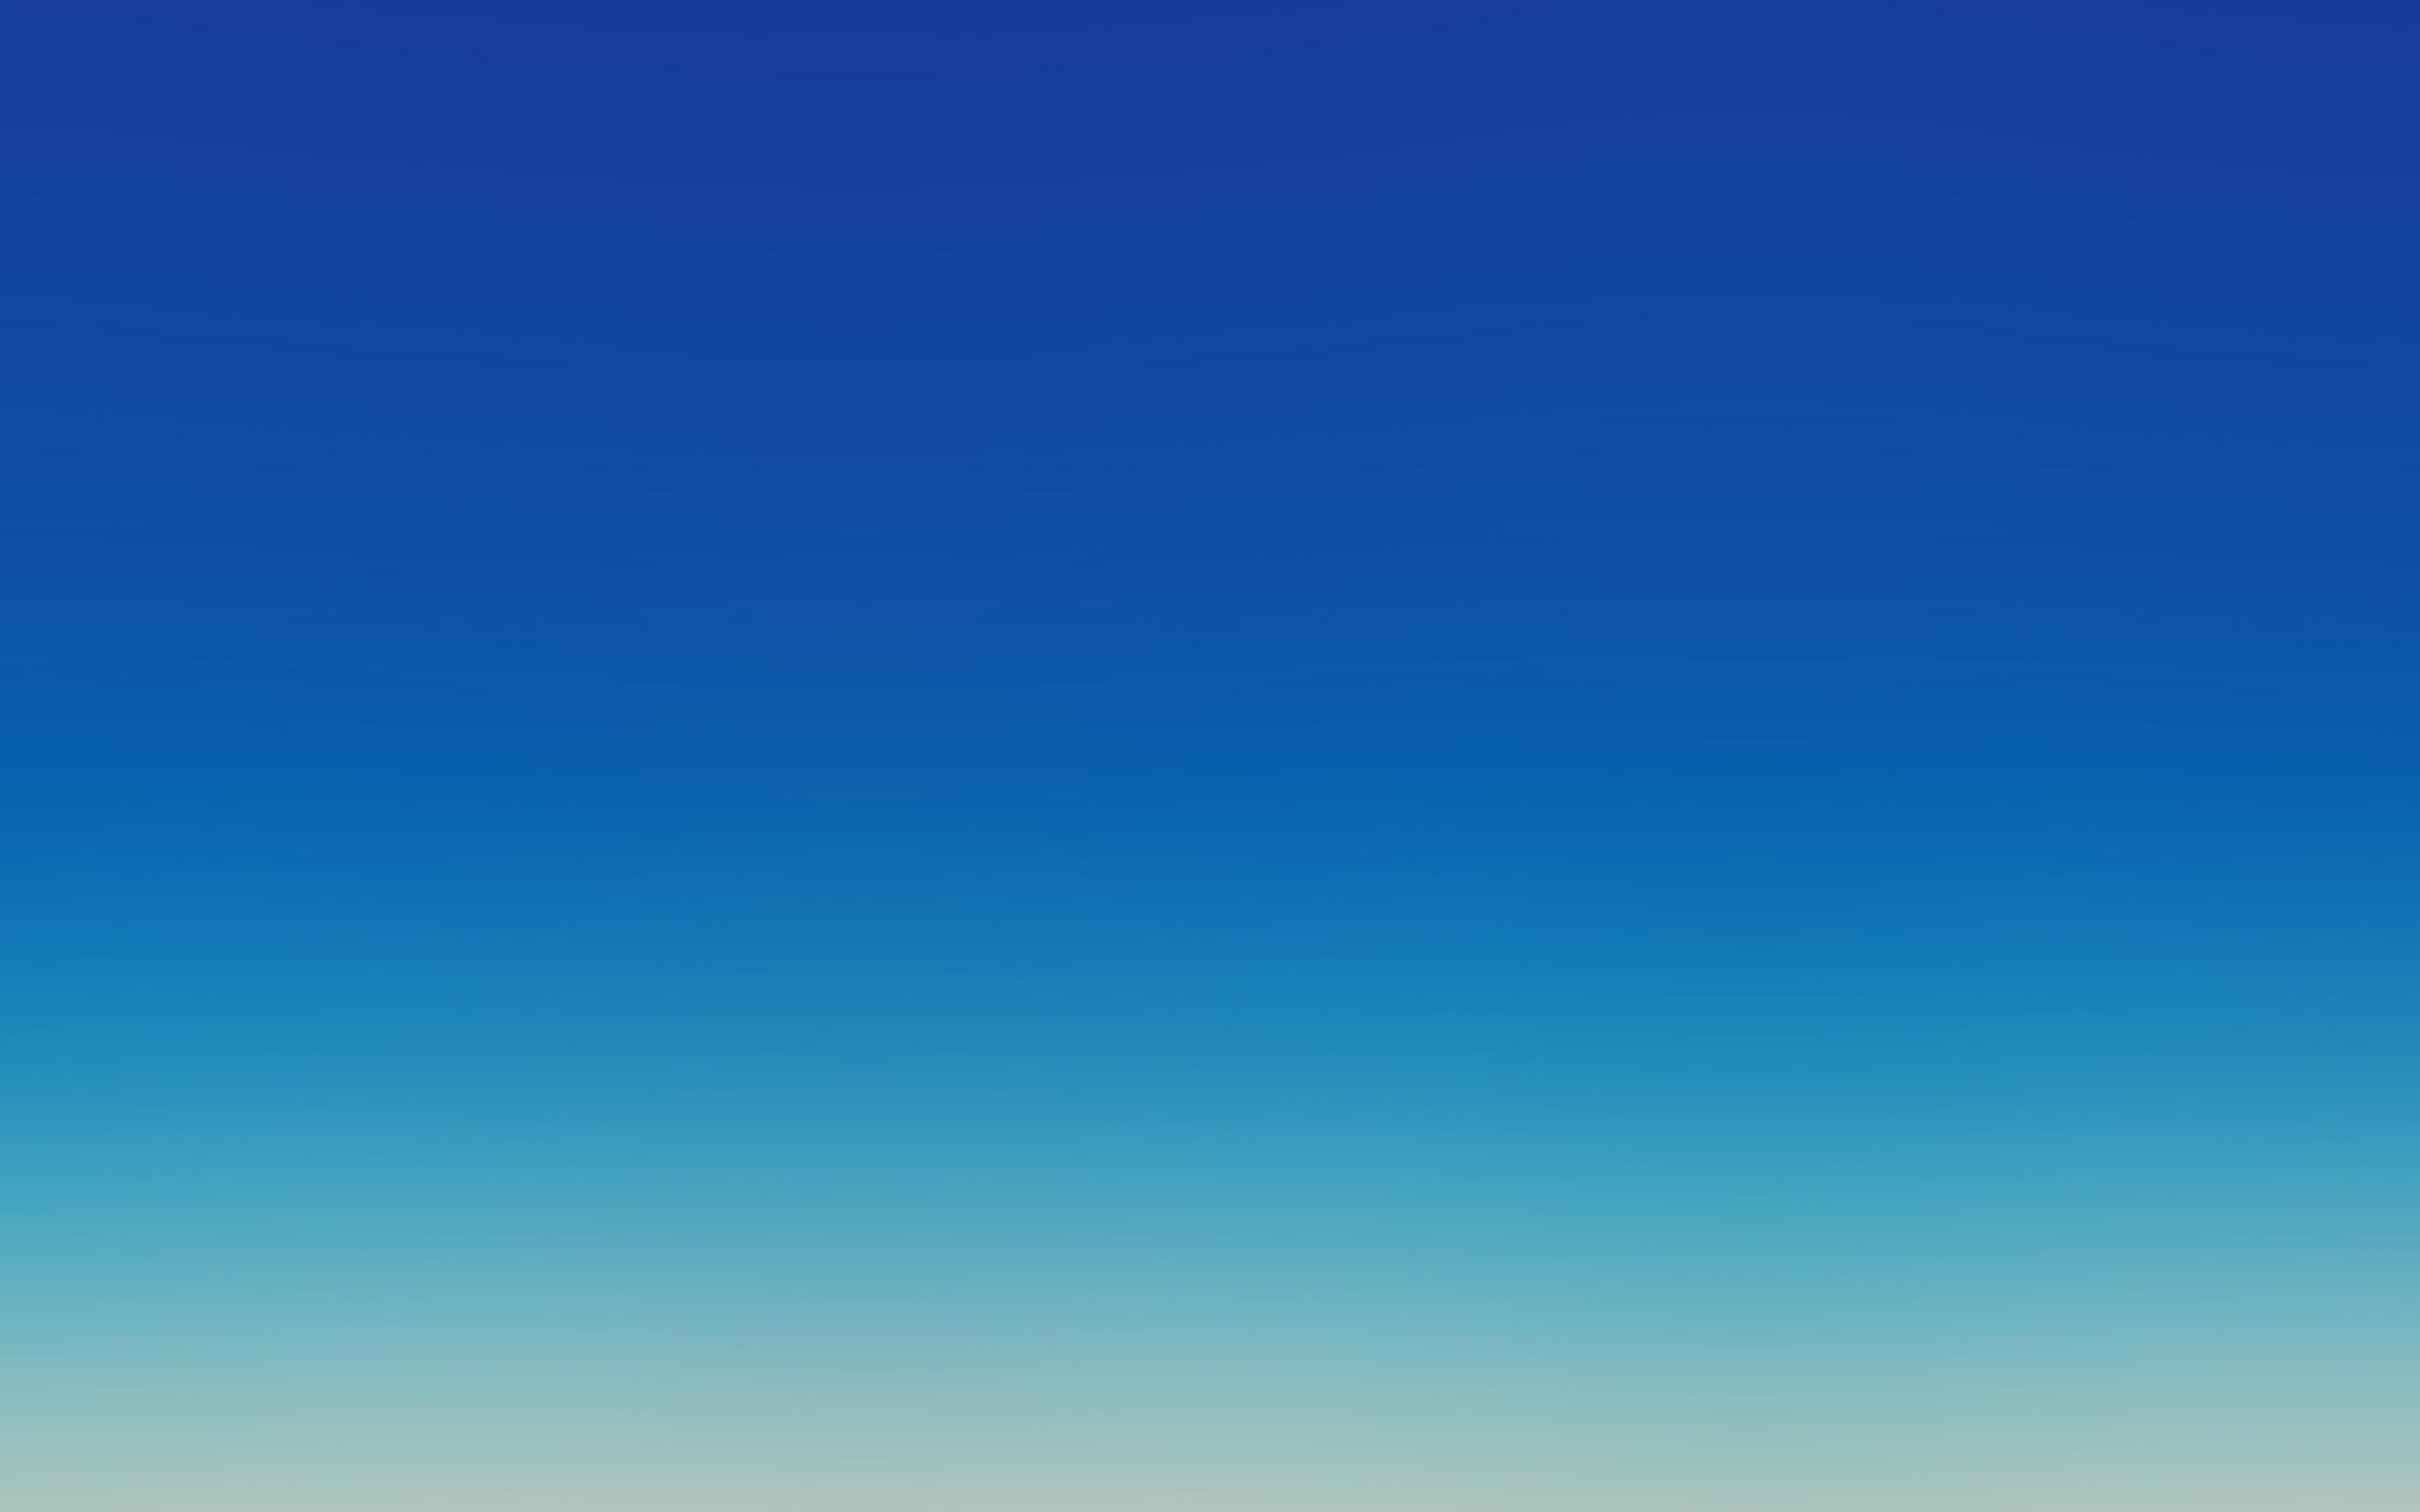 Sb10 wallpaper blue sky blue blur for Wallpaper photo